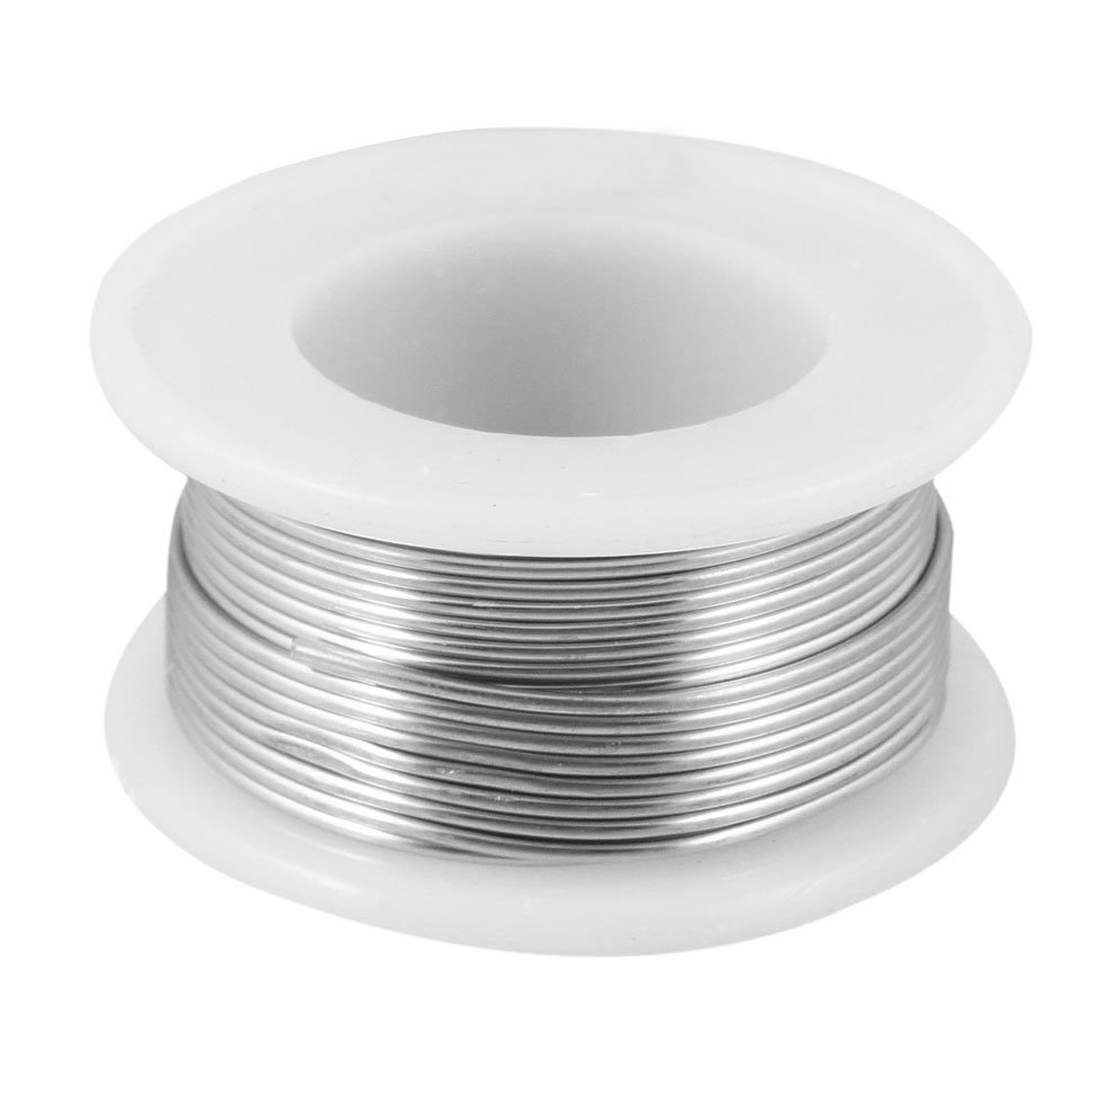 1.2% Flux 1mm Diameter Tin Lead Soldering Rosin Core Wire Silver ...